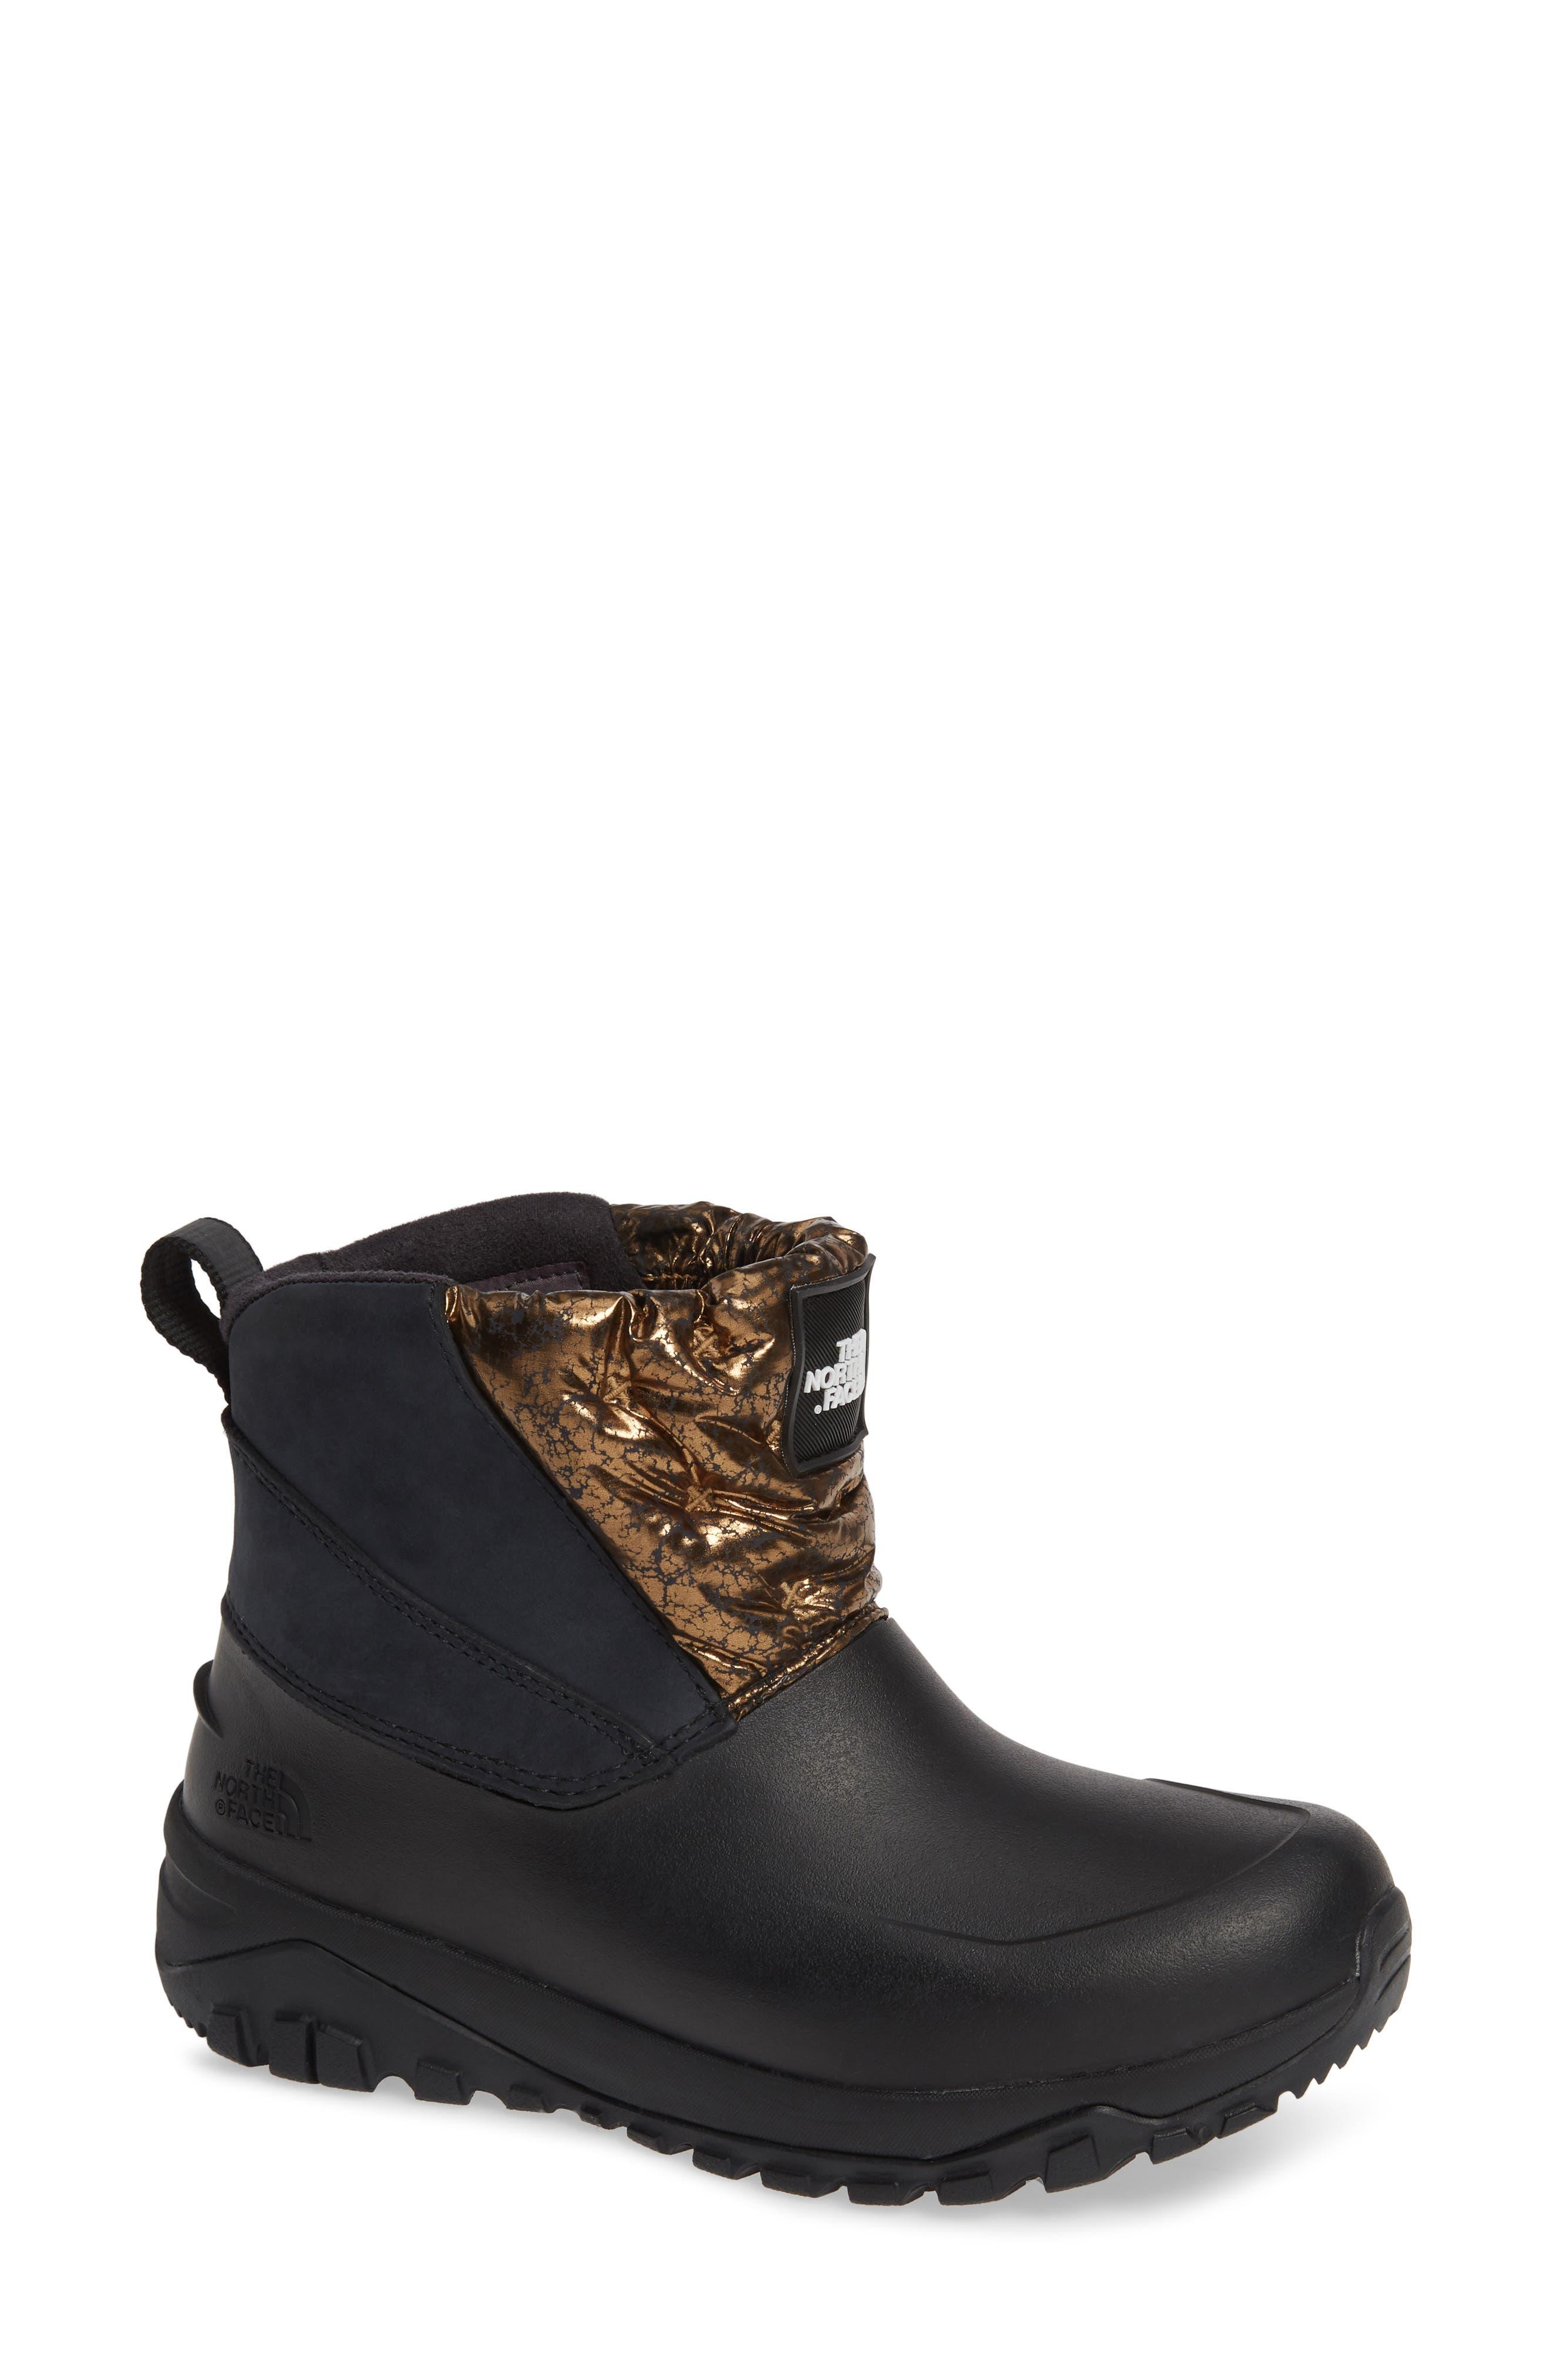 Yukiona Waterproof Ankle Boot,                         Main,                         color, BLACK/ METALLIC COPPER